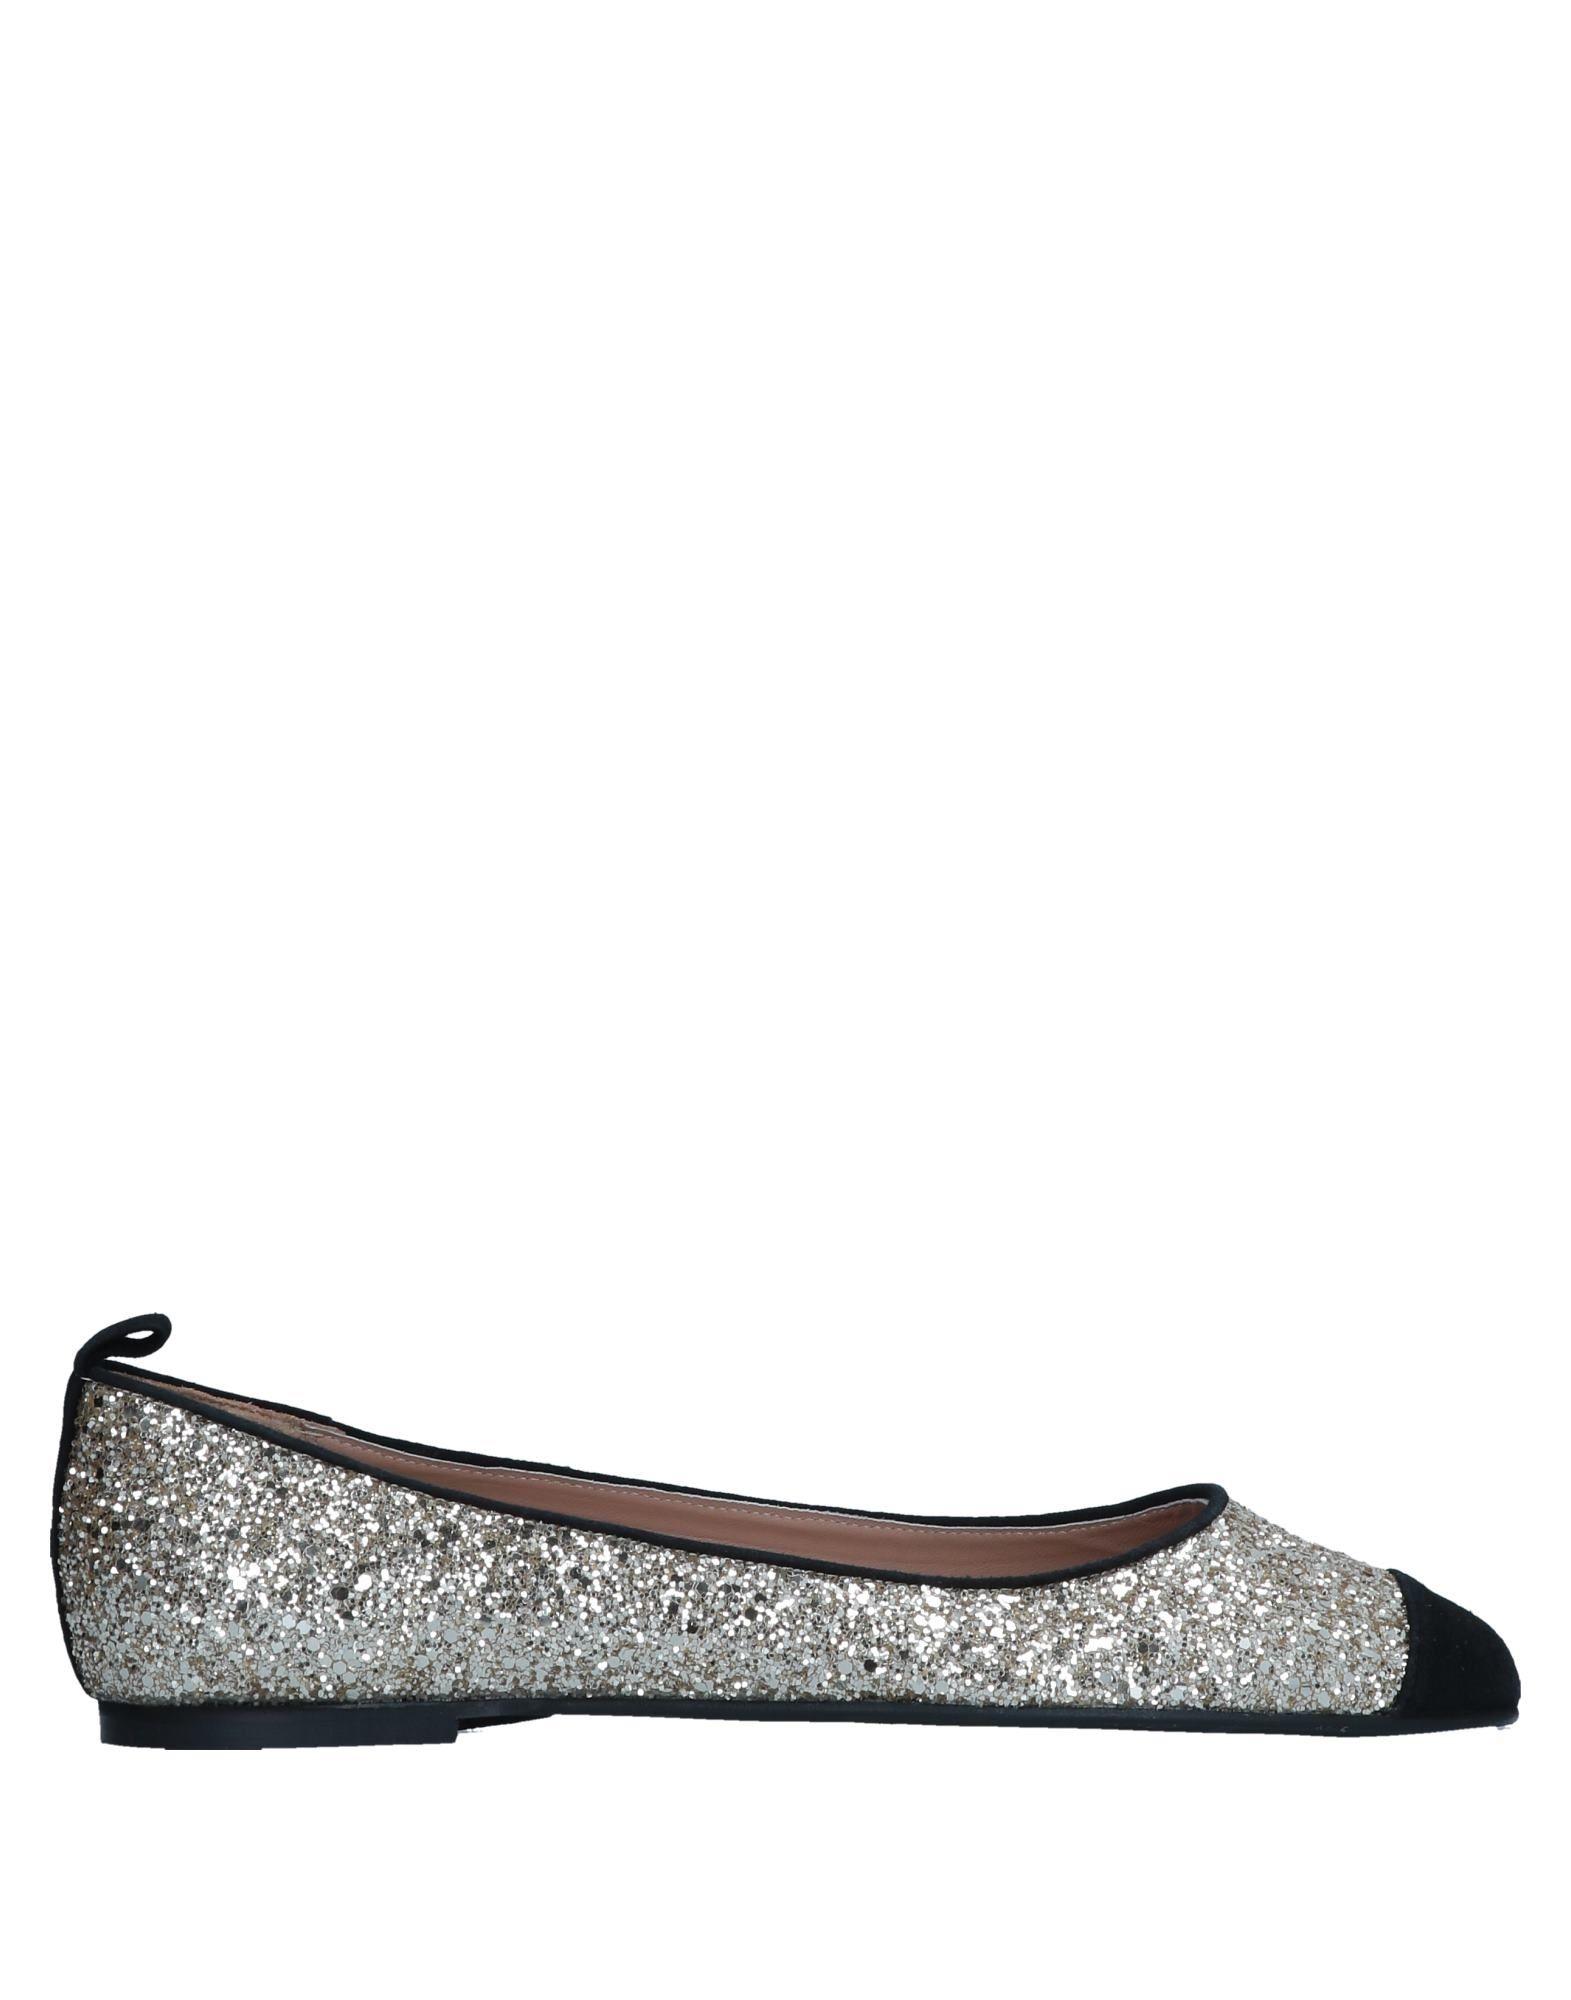 Il Borgo Firenze Ballerinas Damen  11547718WO Gute Qualität beliebte Schuhe